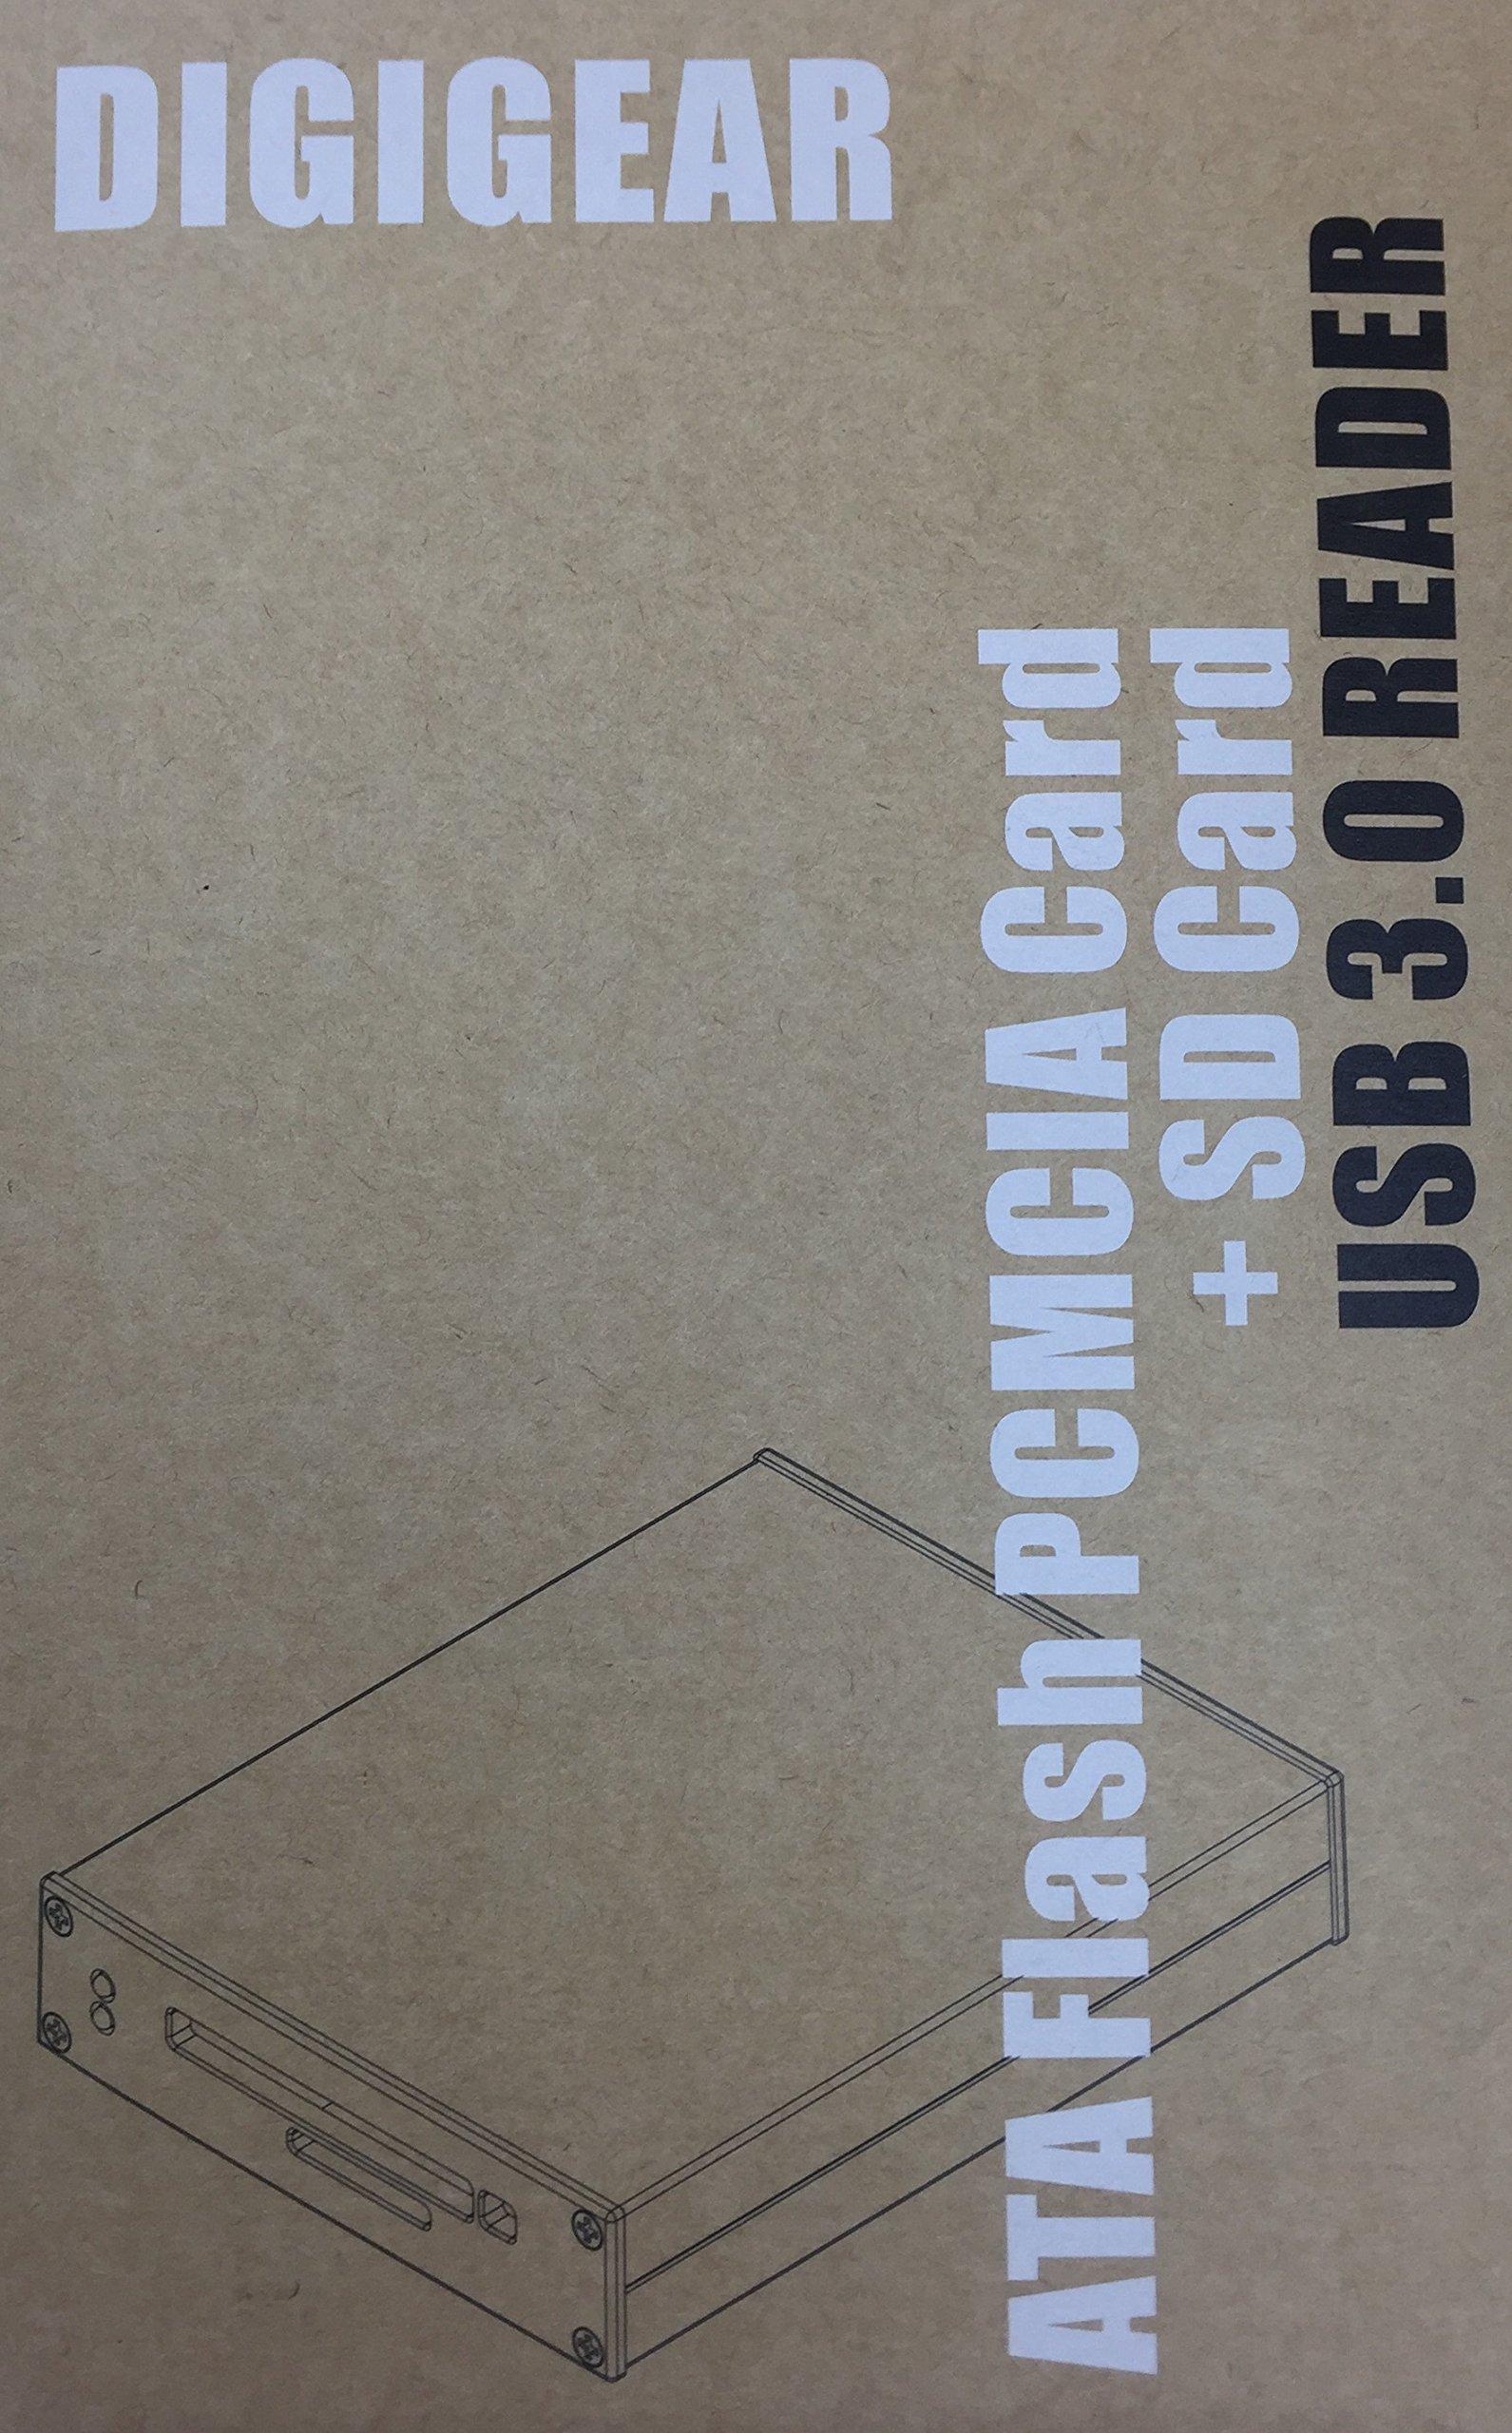 DIGIGEAR ATA Flash PCMCIA PC Card & SD/SDHC/SDXC USB 3.0 Industrial Grade Reader by Digigear (Image #4)